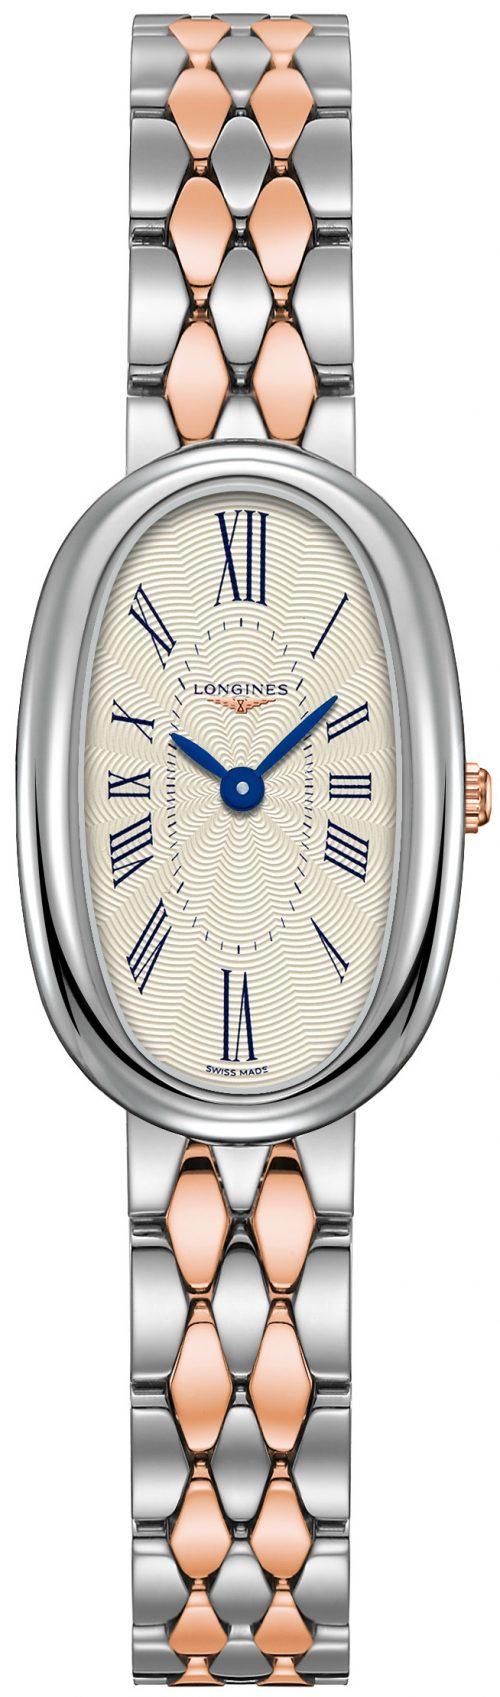 Longines Symphonette Damklocka L2.305.5.71.7 Silverfärgad/18 karat